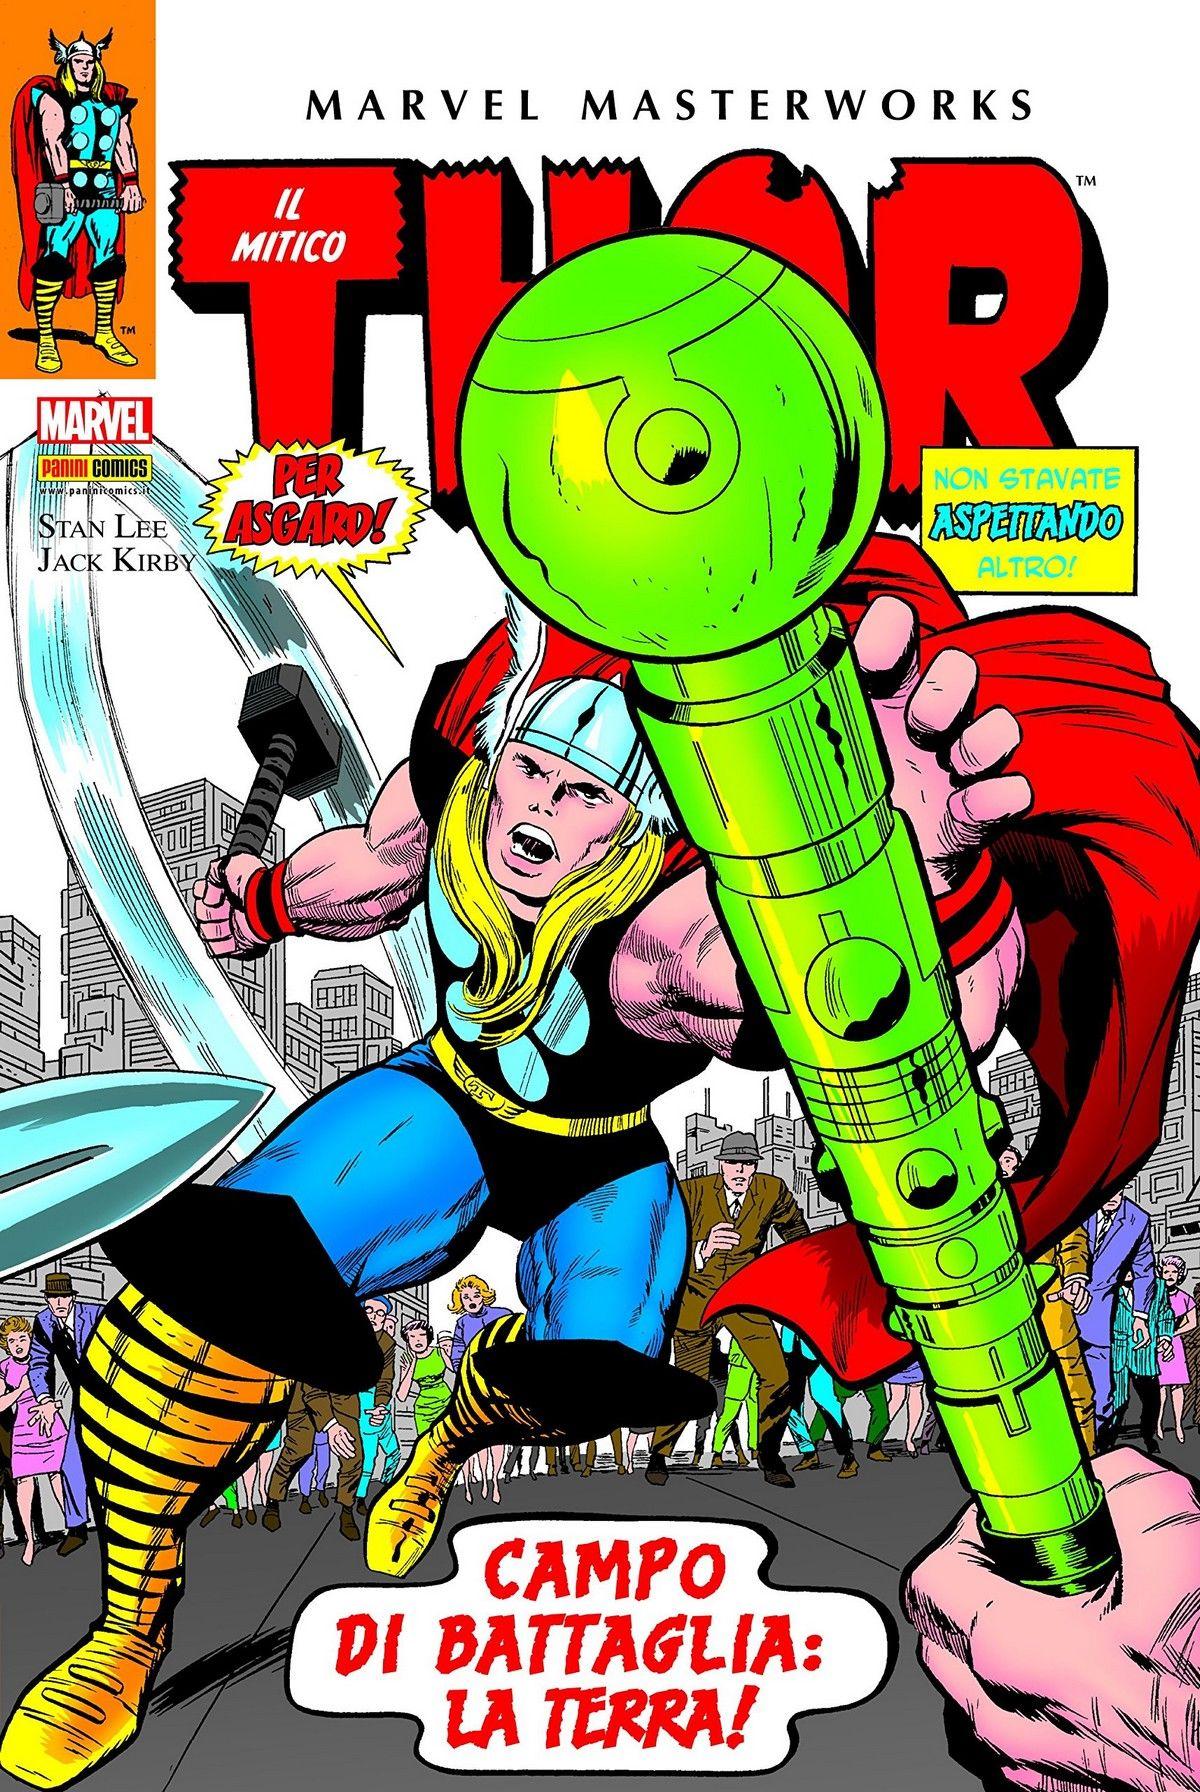 Marvel_Masterworks_Thor_4_panini_fronte